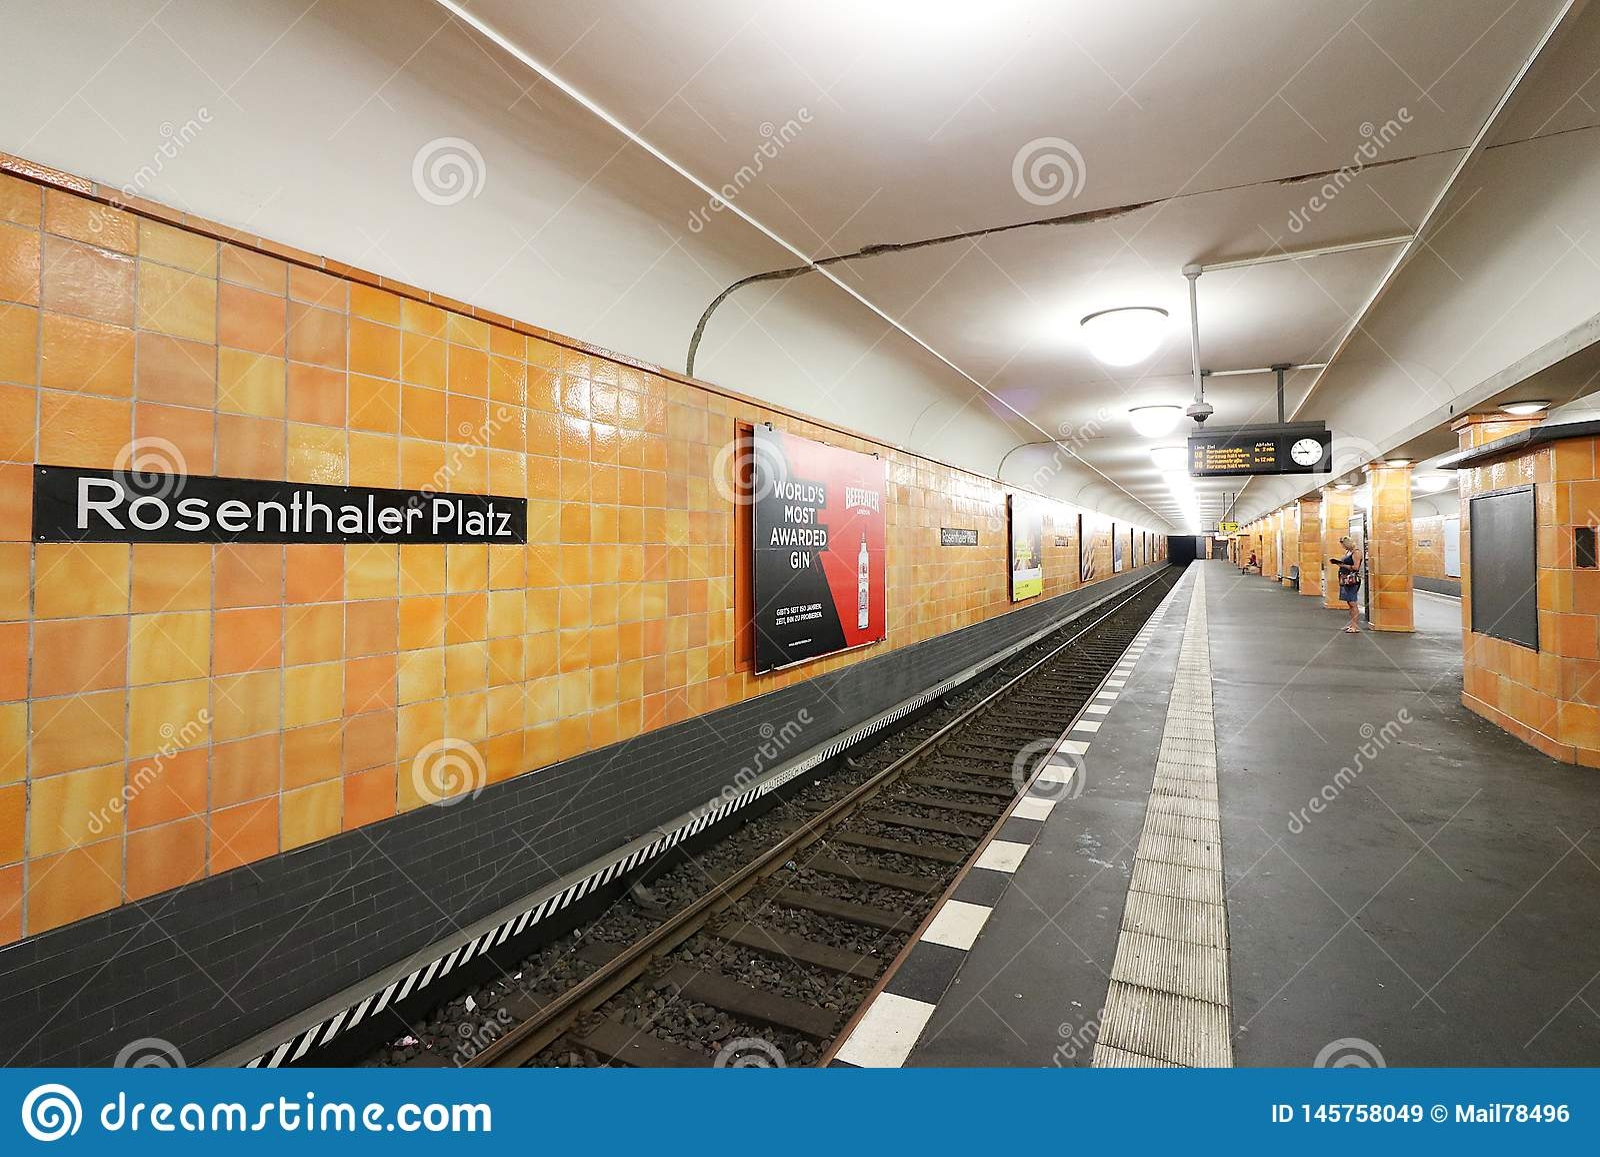 Berlin, Germany, 13 June 2018. Rosenthaler Platz underground station. Walls covered in orange ceramic